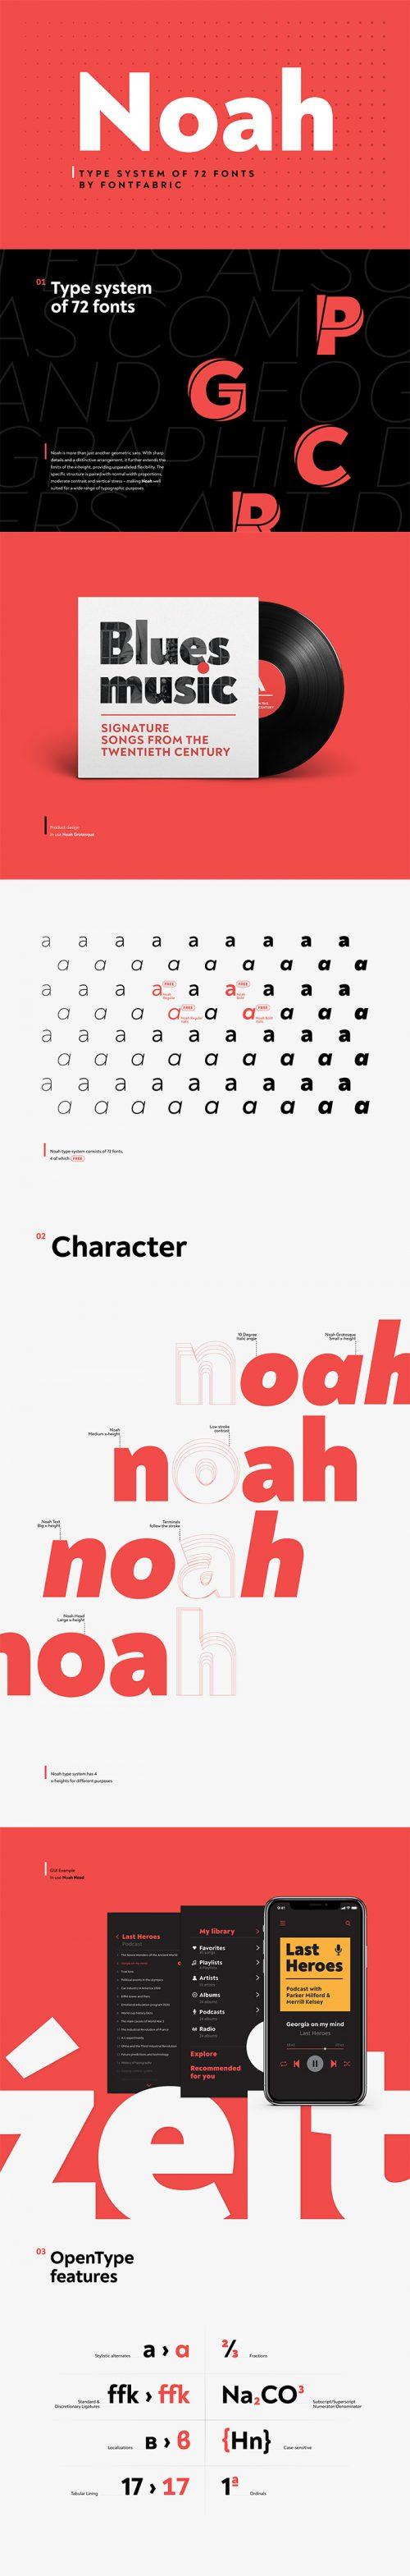 Asset | Noah Font Typeface